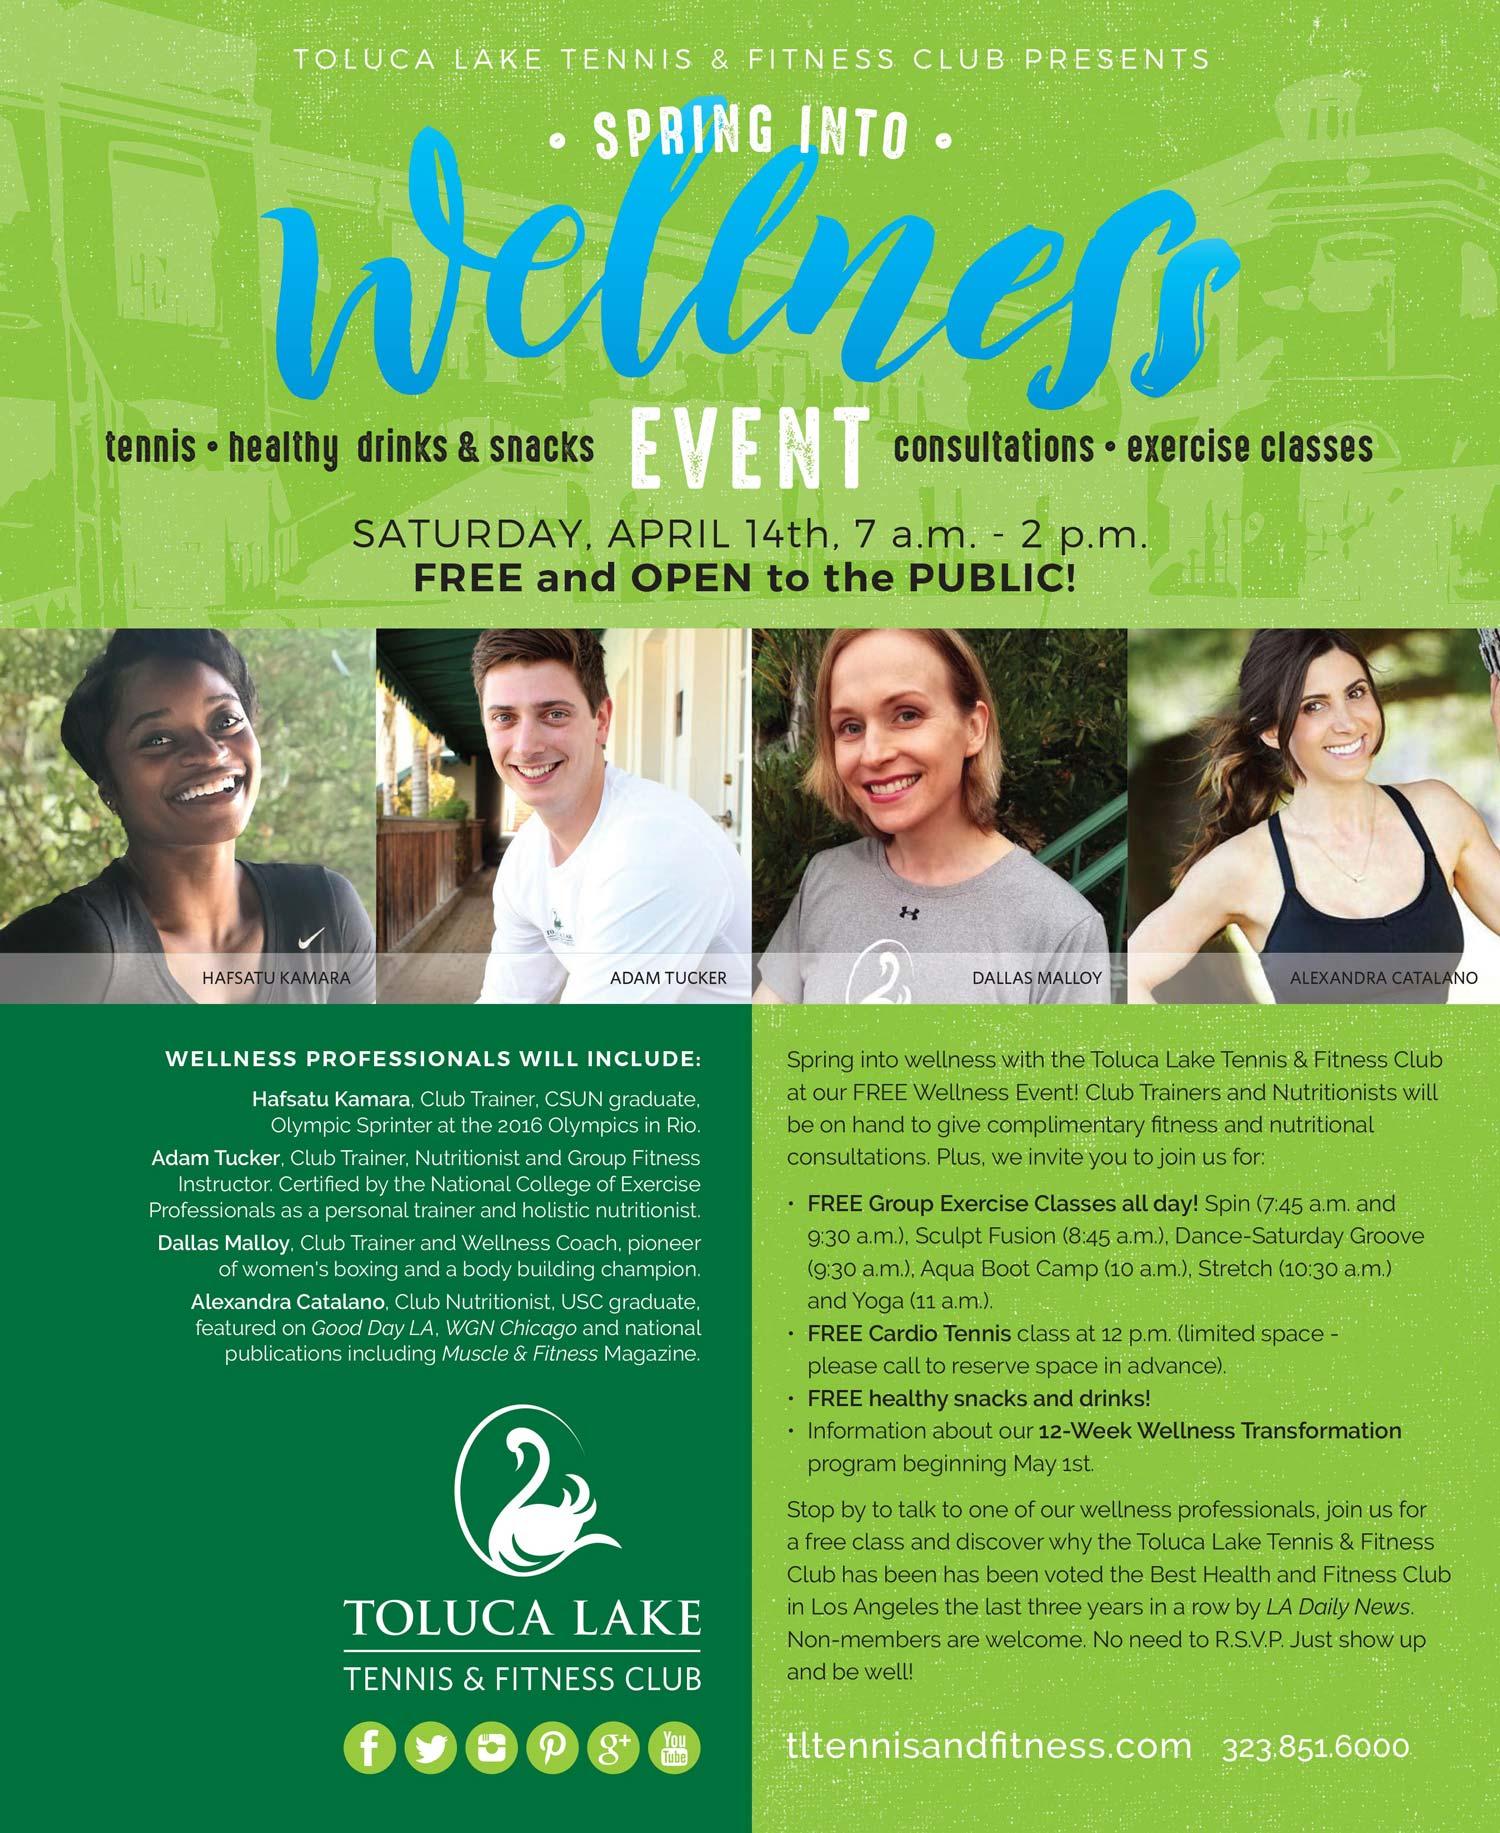 TLTC spring event